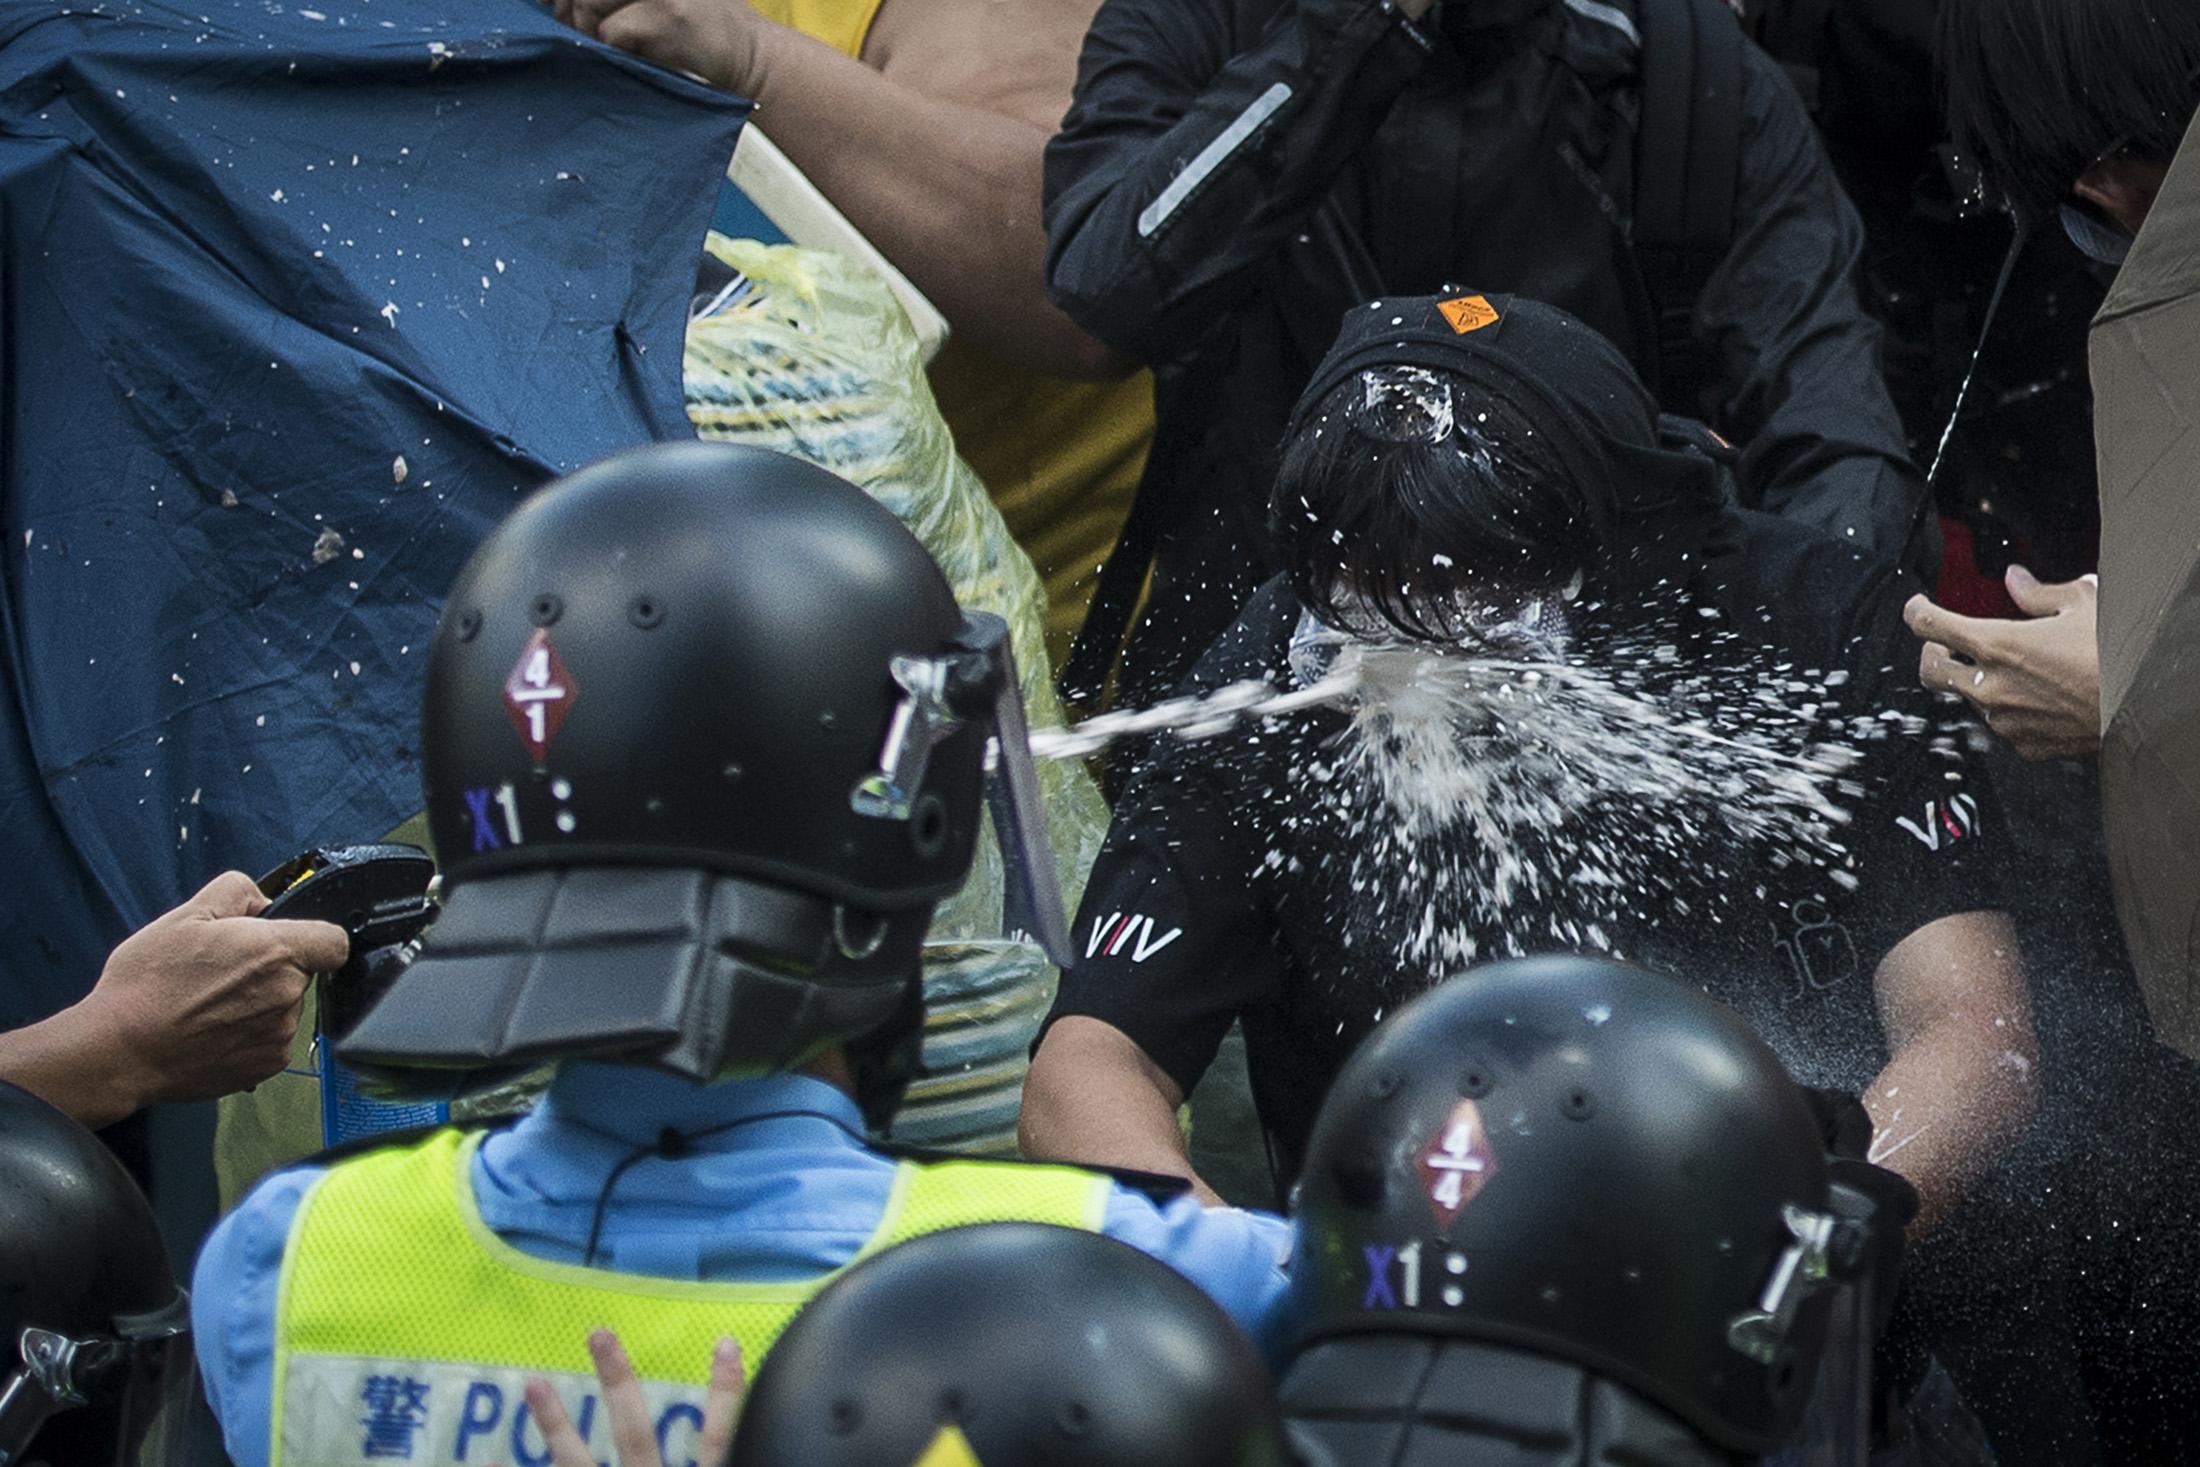 Occupy003.jpg